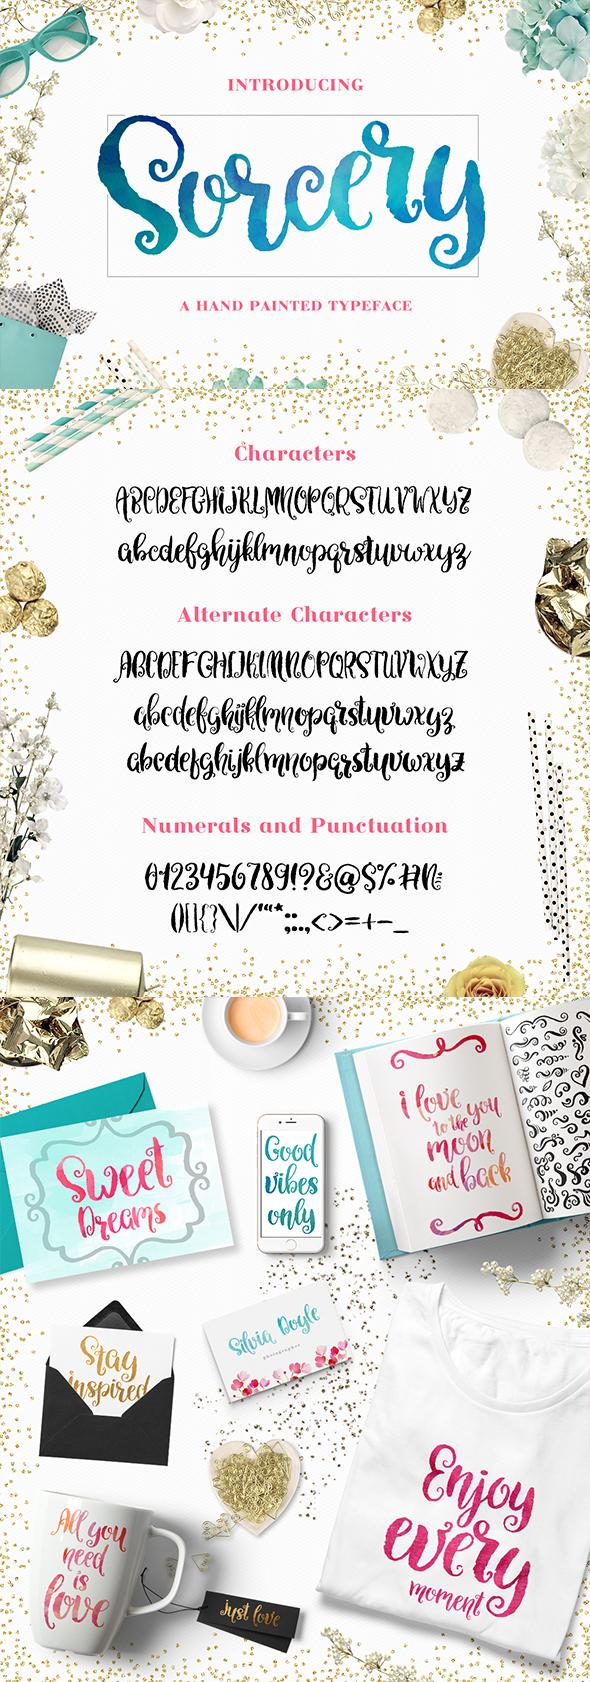 Sorcery Typeface - Brush Script - Hand-writing Script